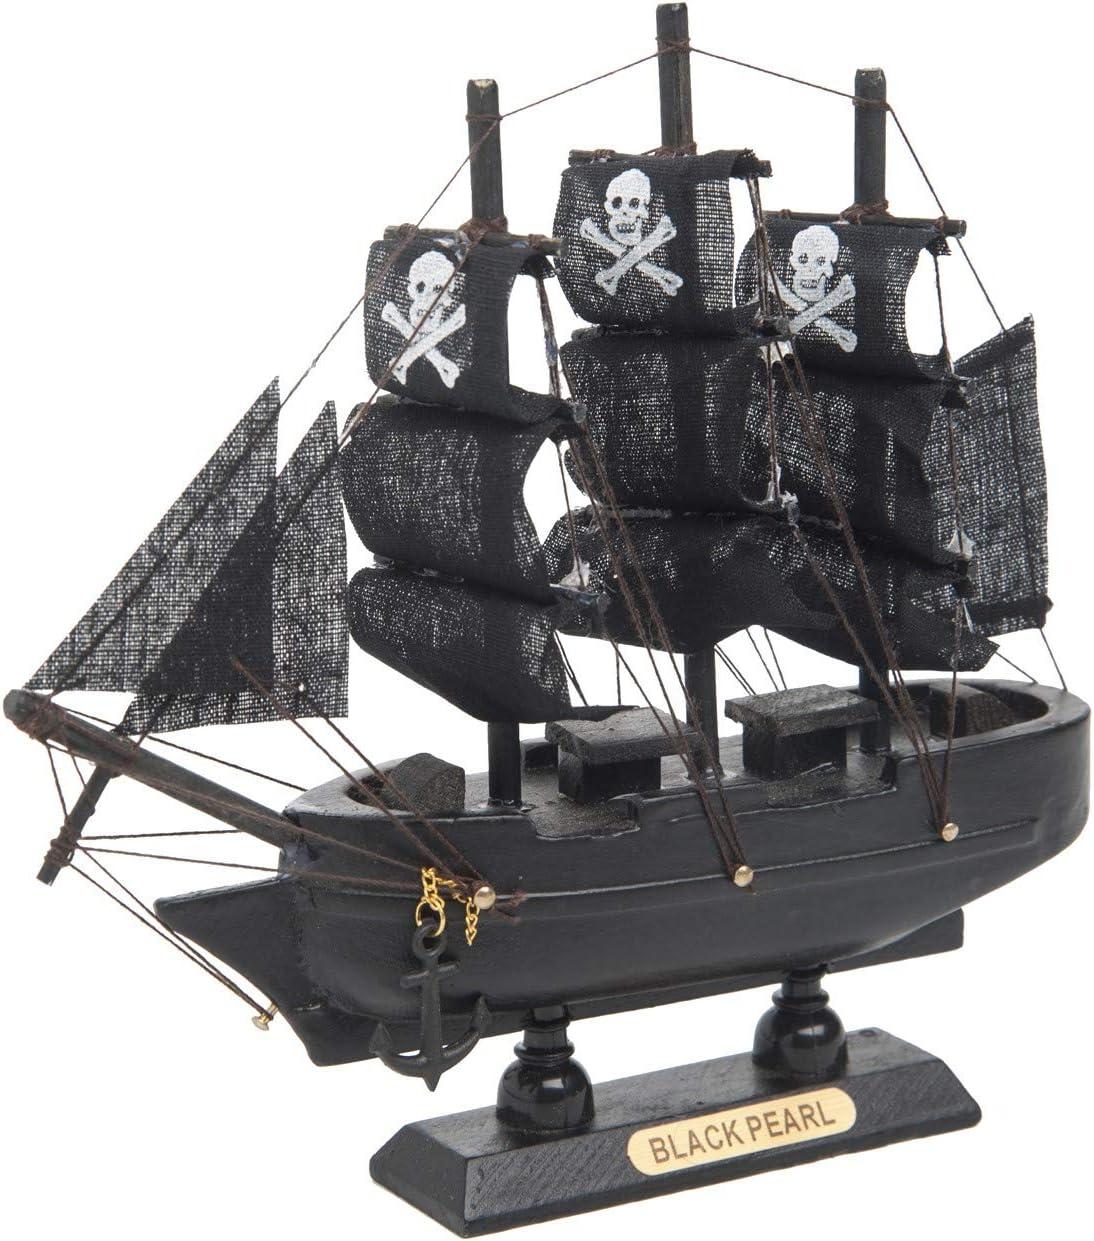 Beachcombers SS-BCS-20397 6 x 6 Inch Black Pearl Pirate Ship Wood Tabletop Figurine on Pedestal